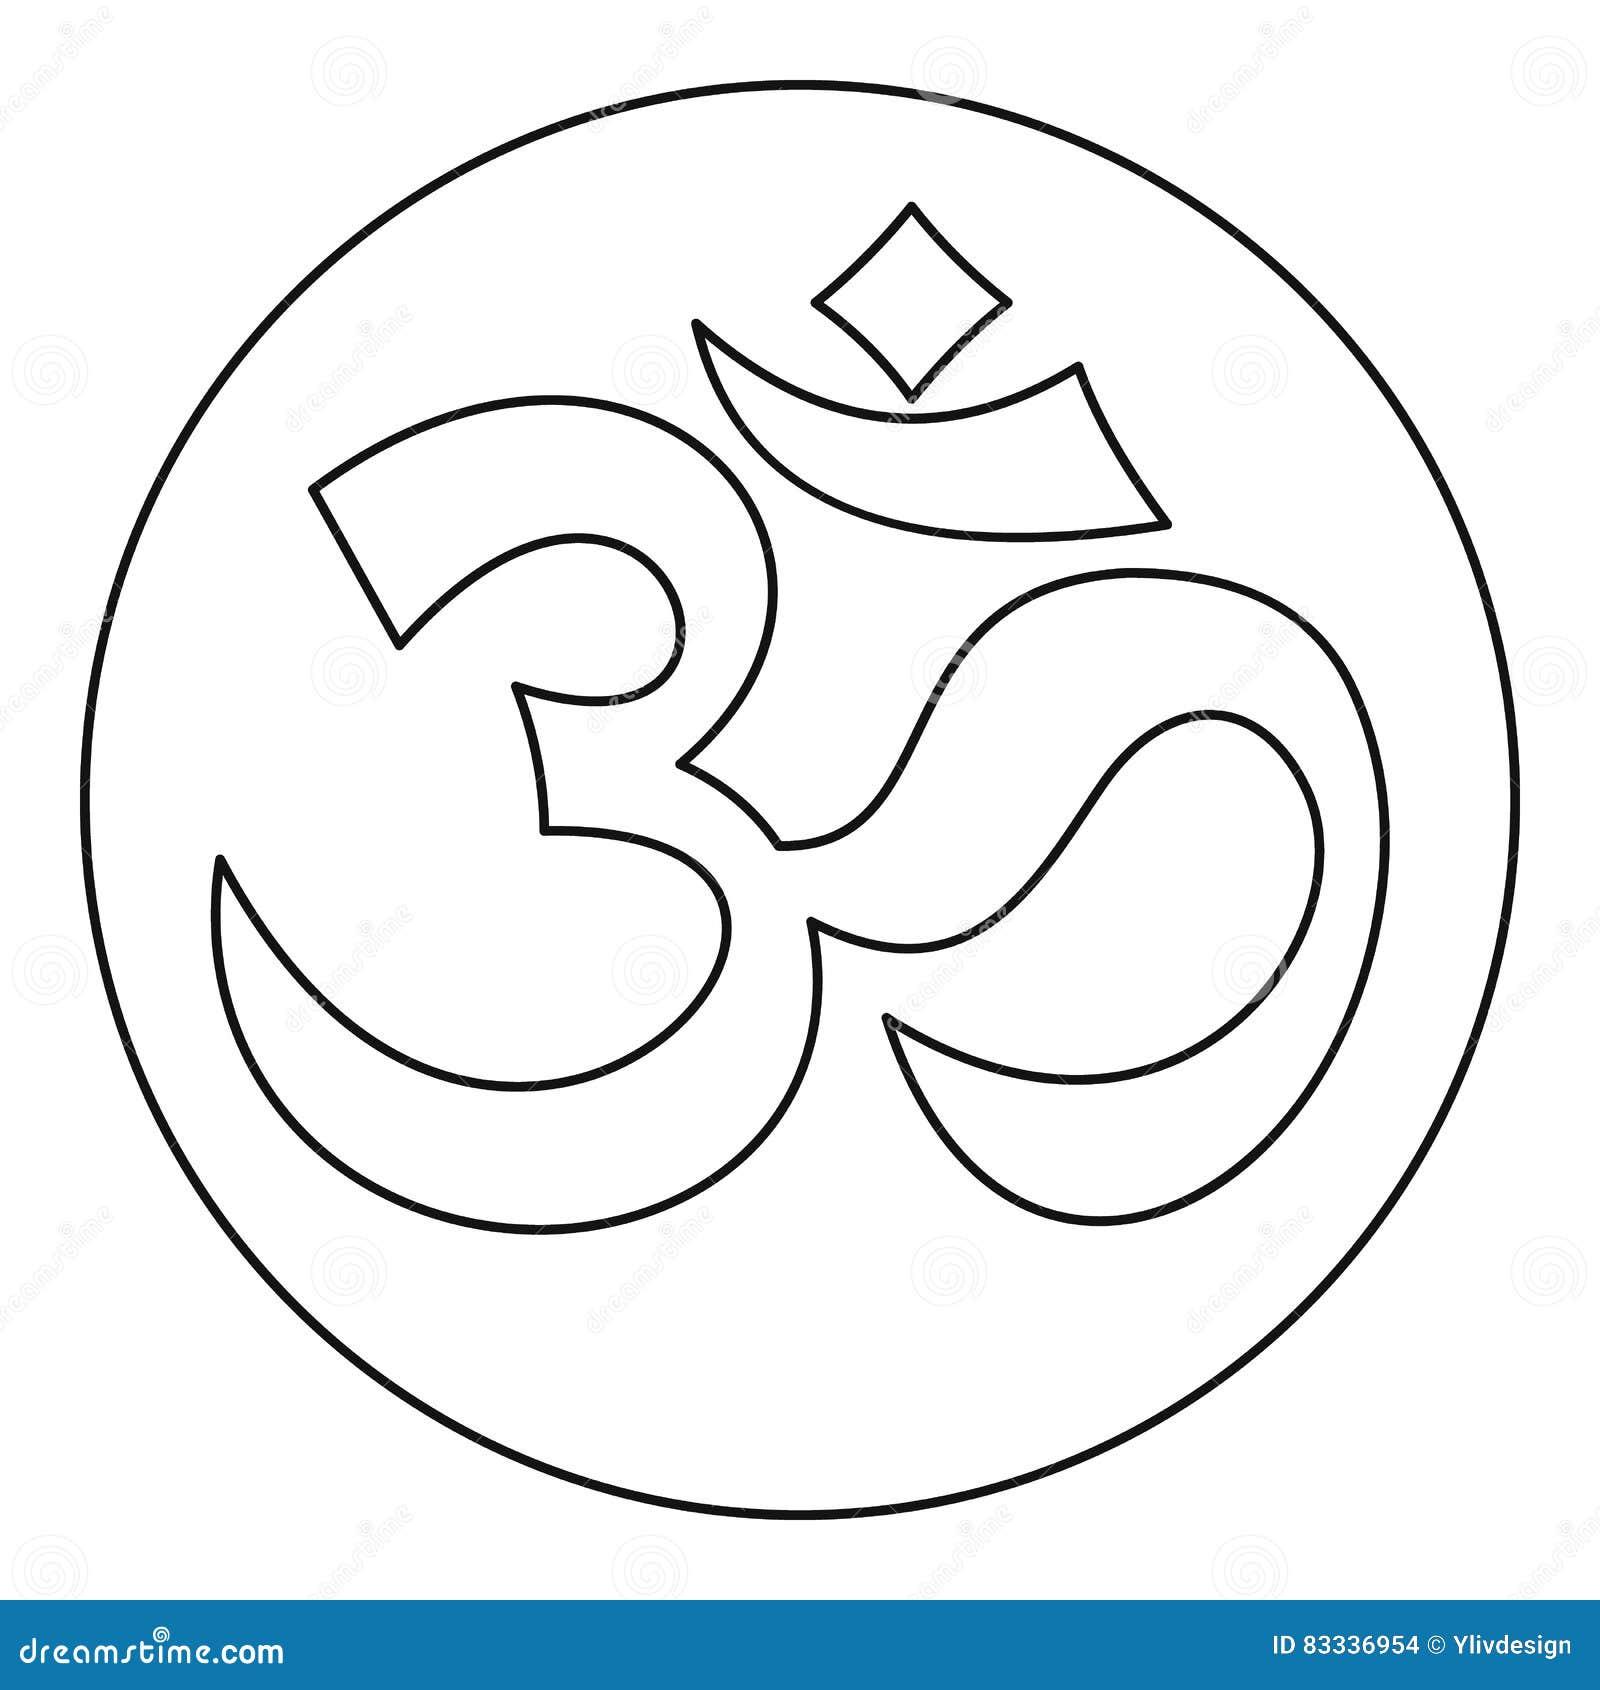 Ohm Symbol Outline | w...